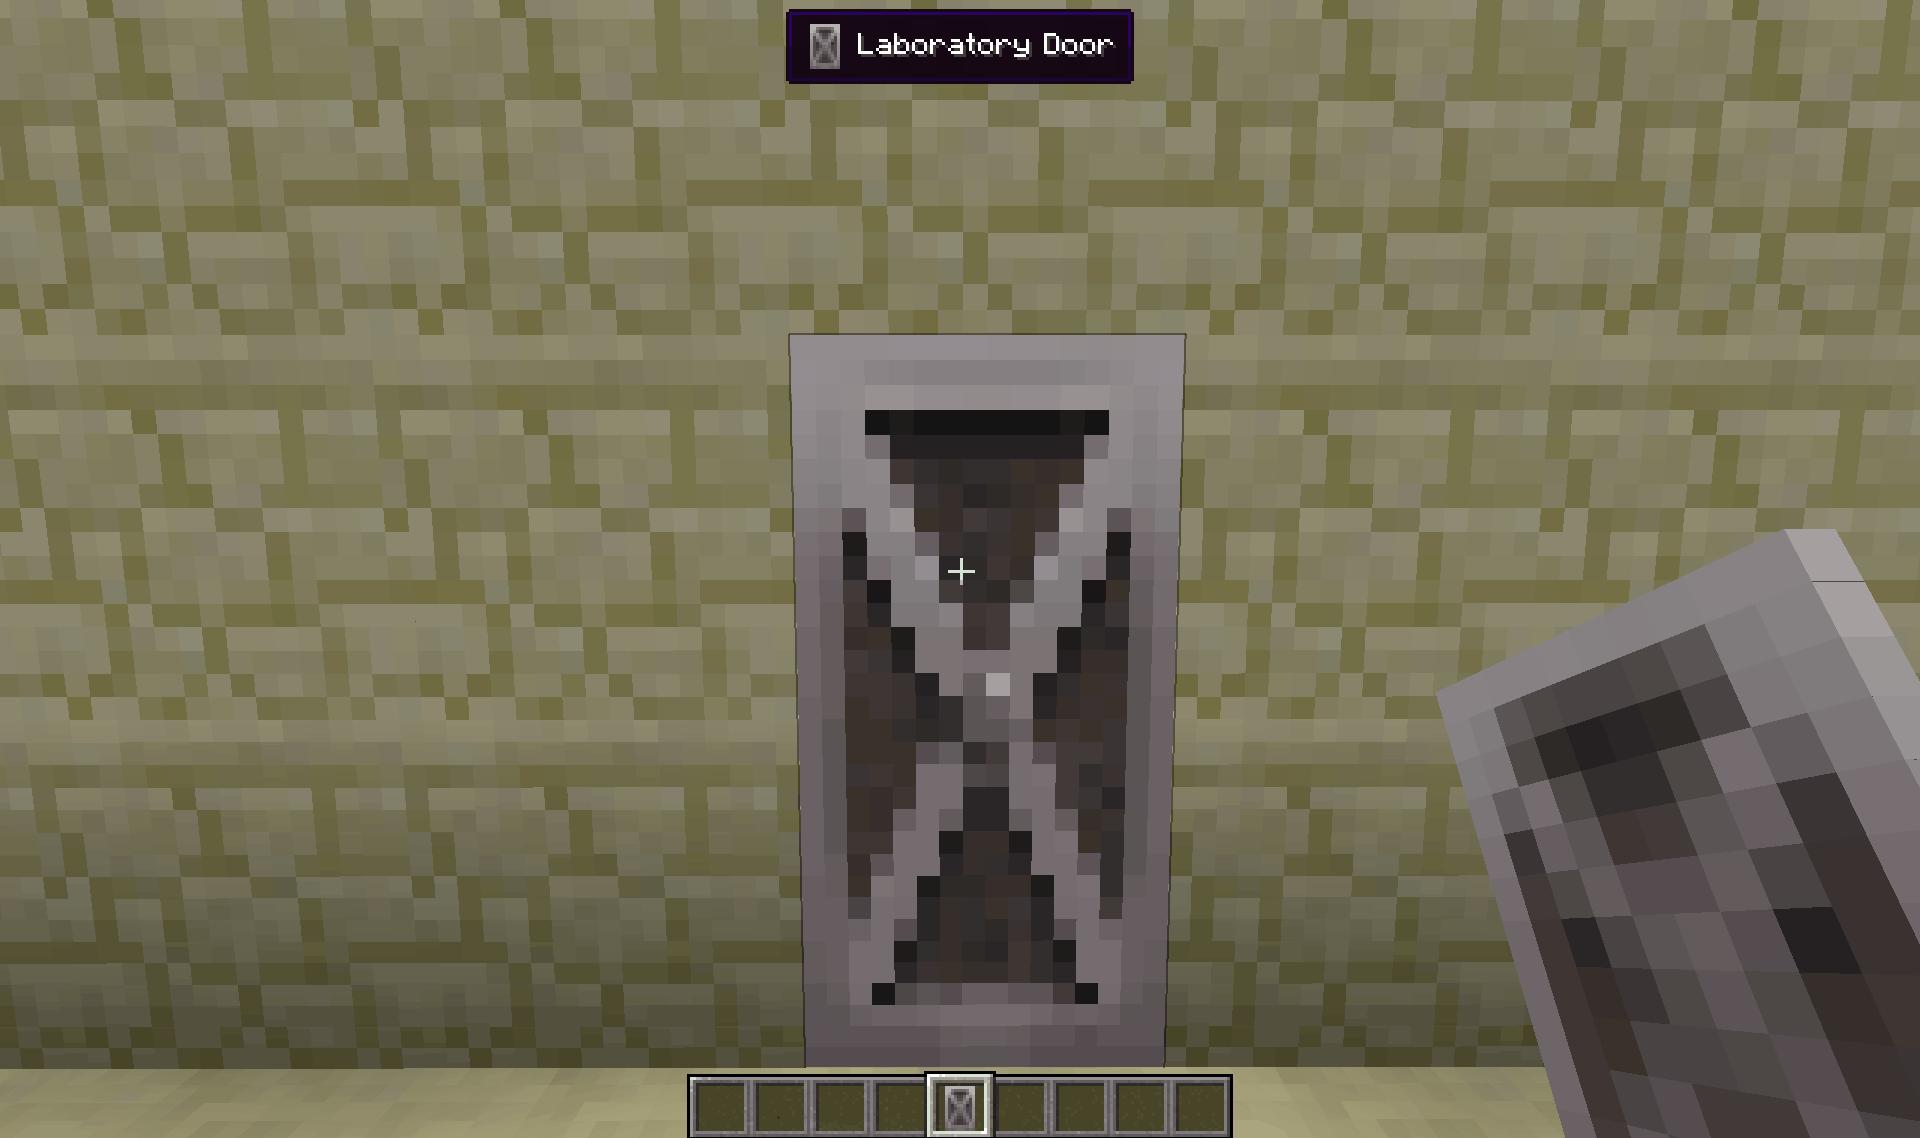 Aperçu en jeu de la porte de laboratoire.